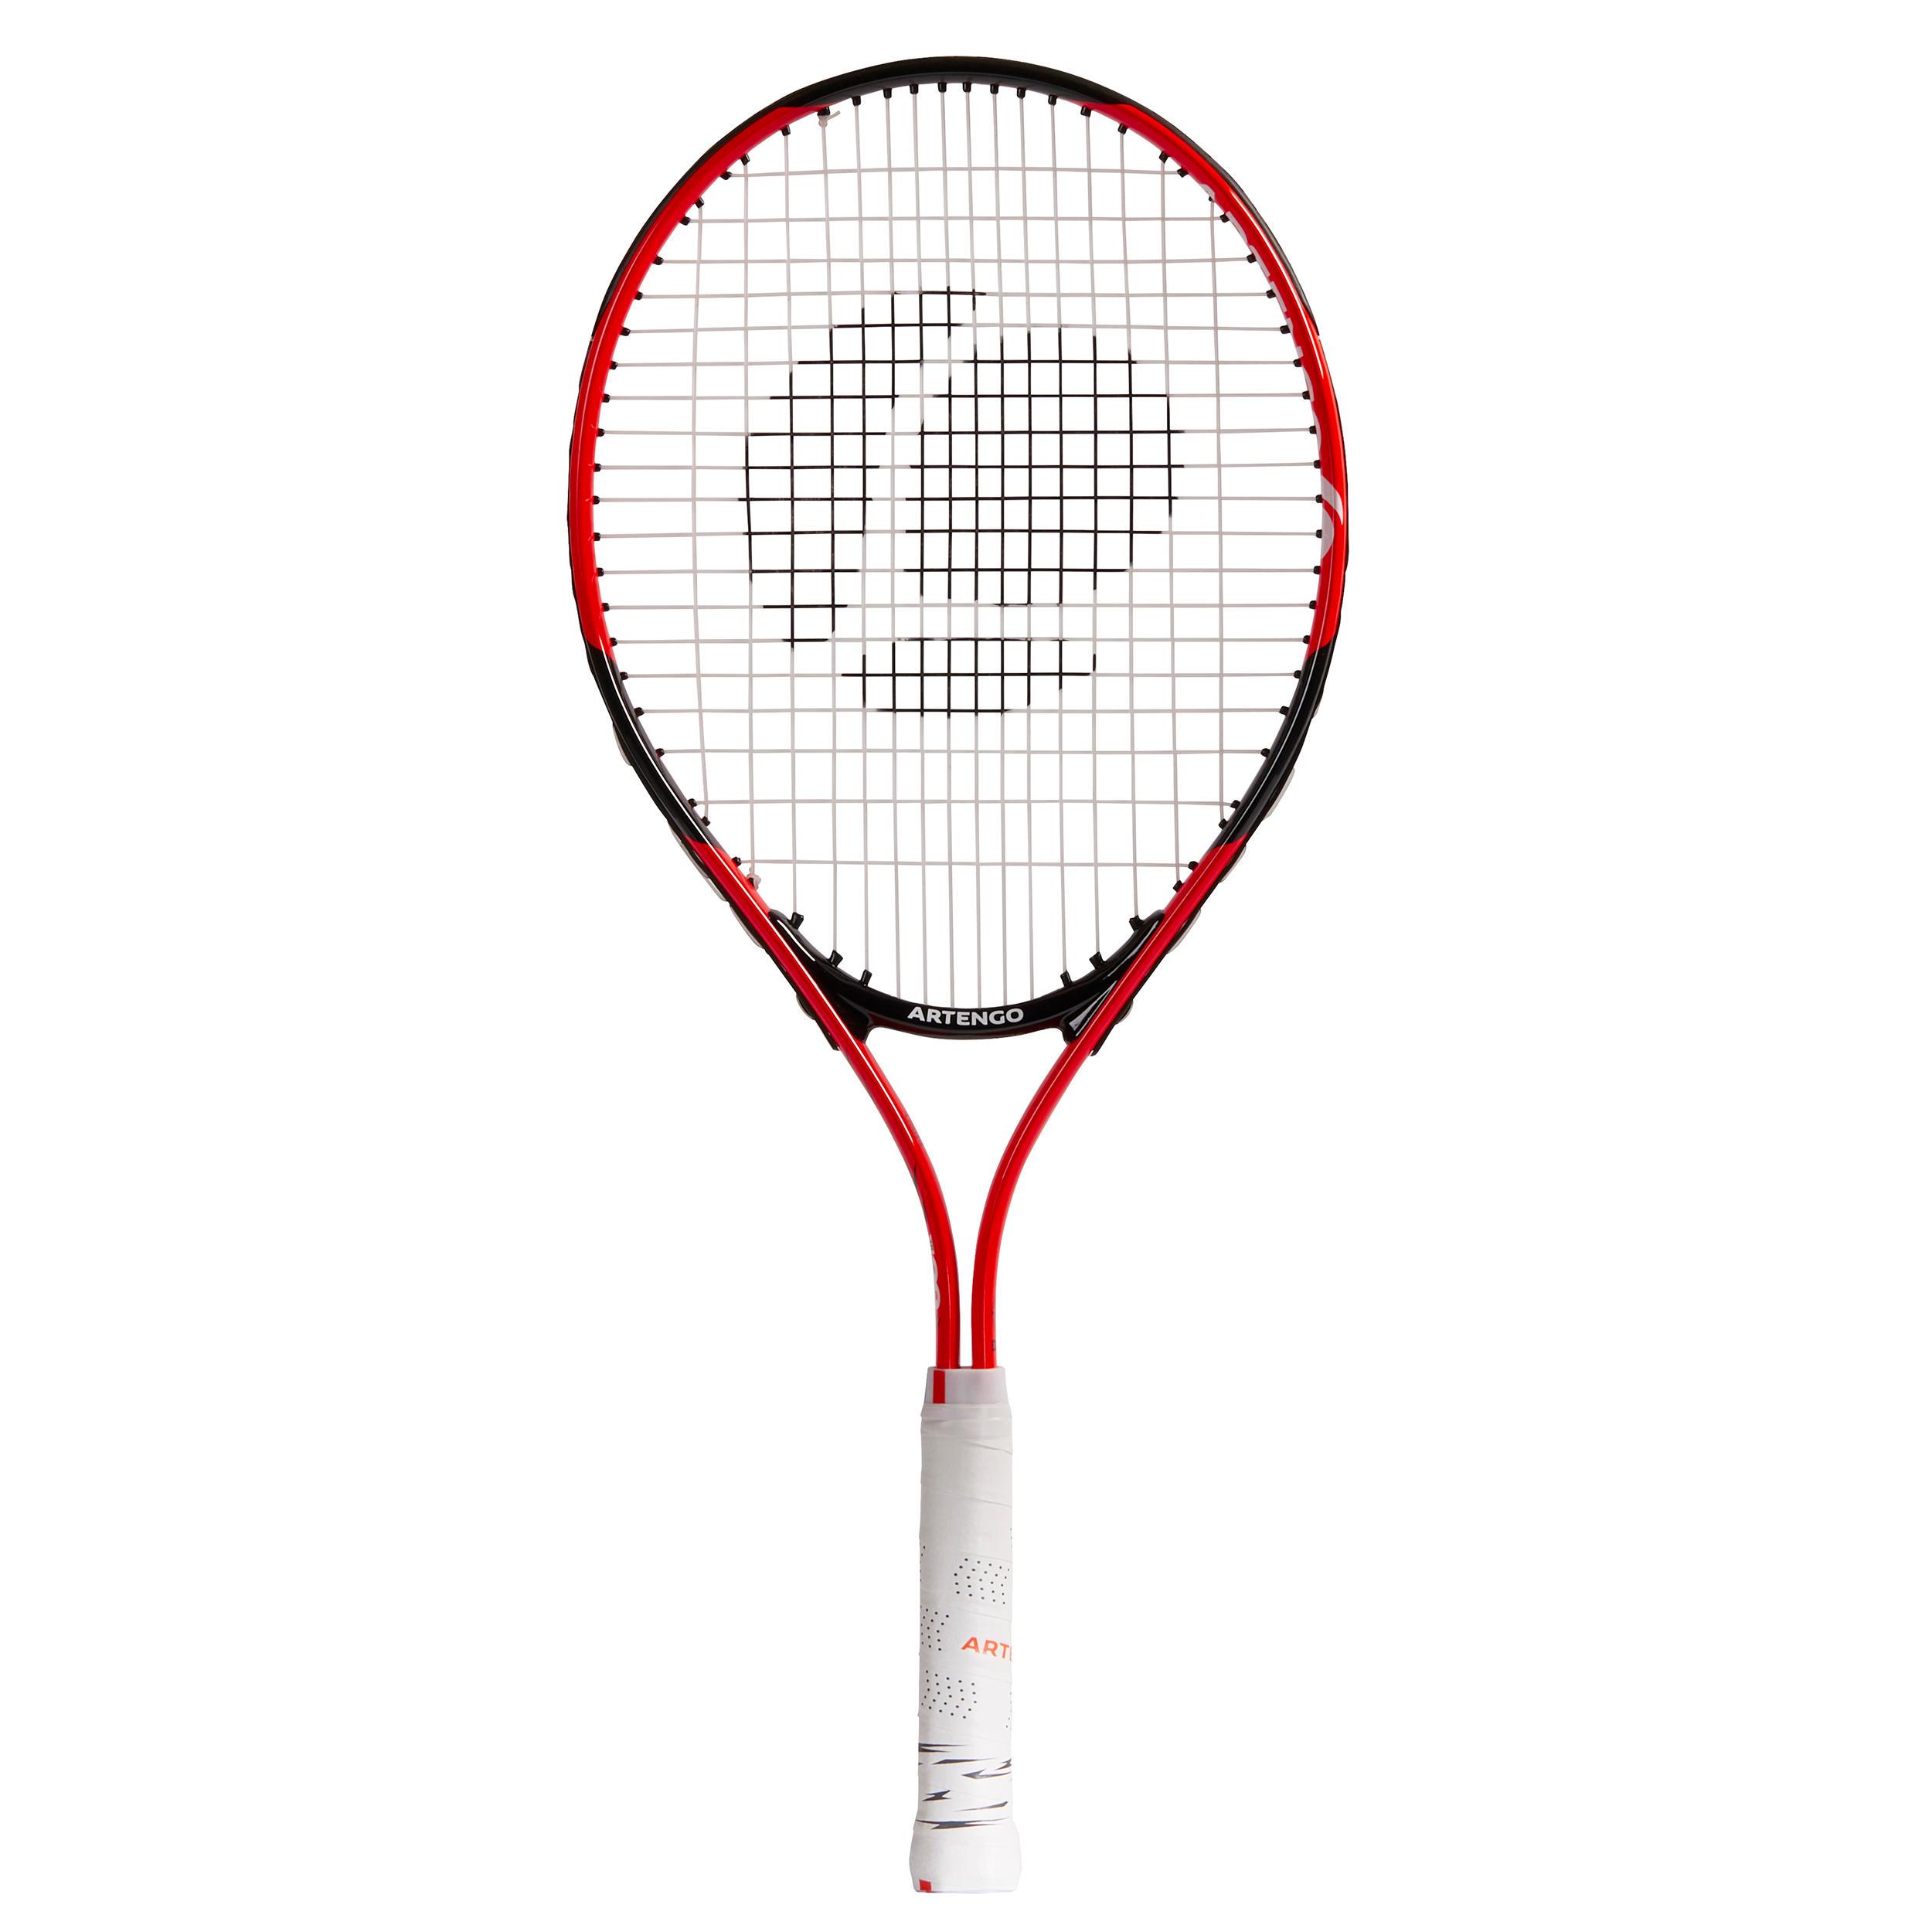 Rachetă Tenis TR130 M25 Copii imagine